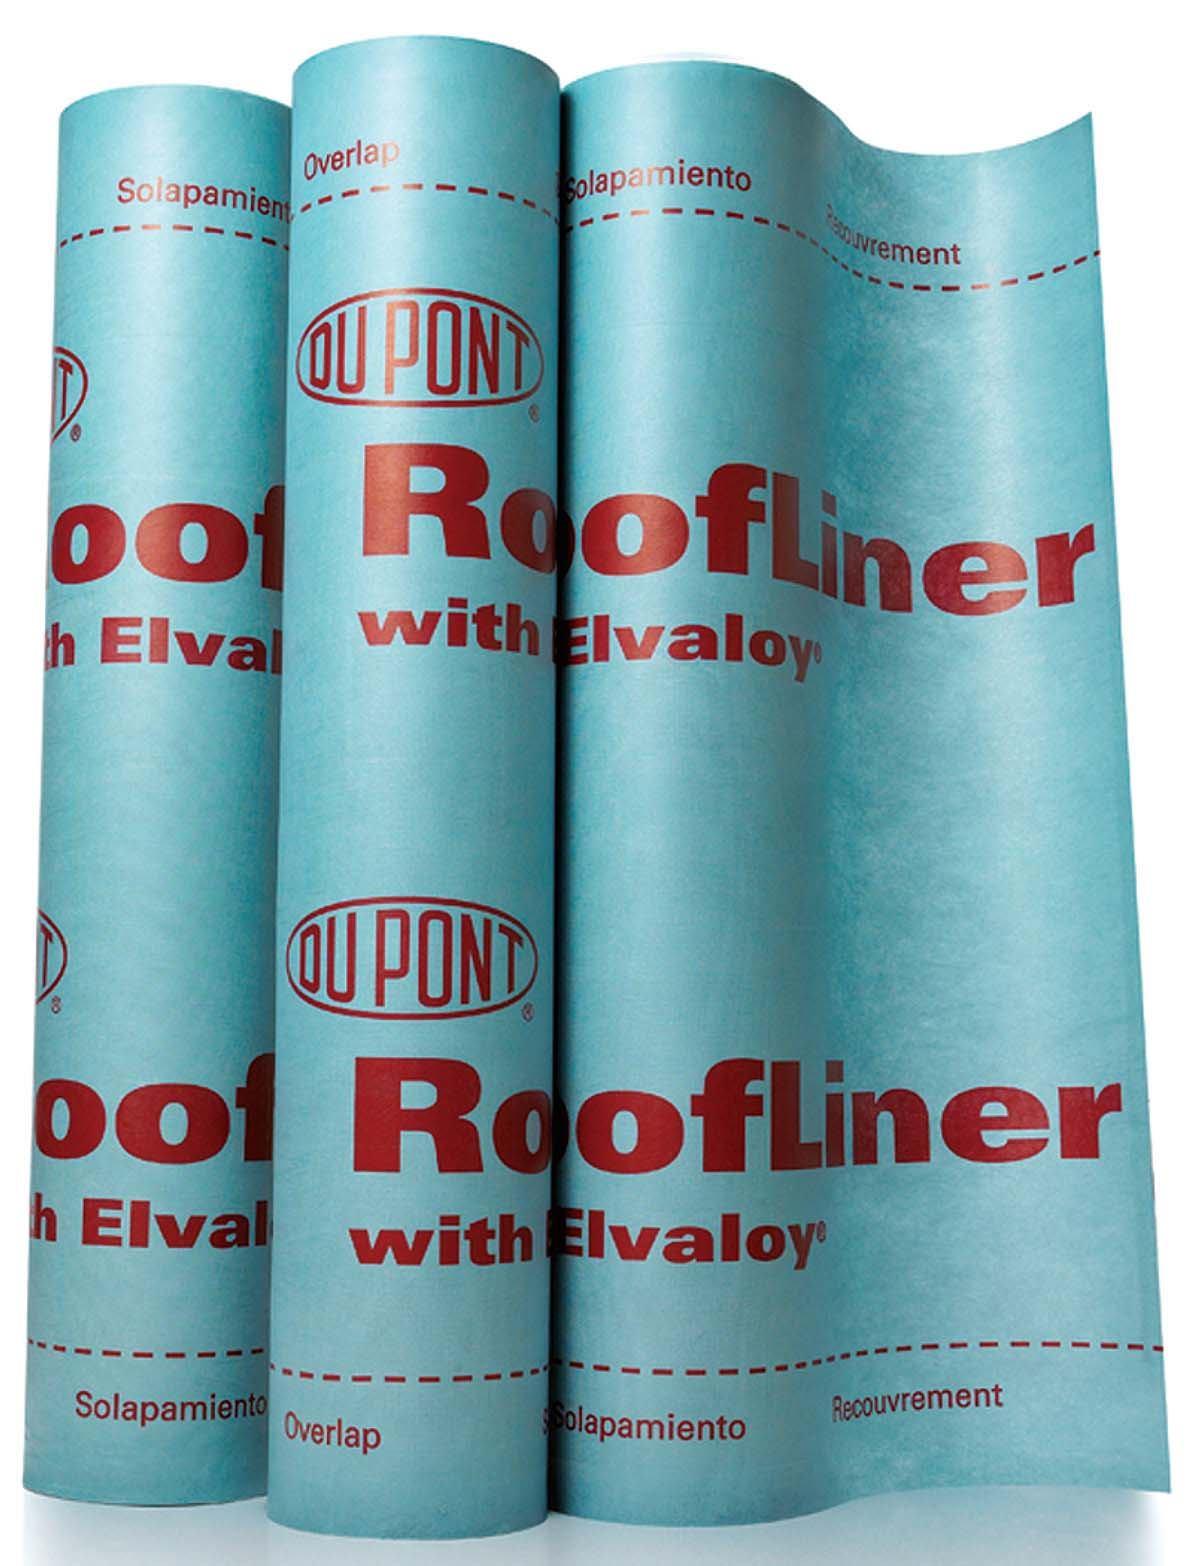 Roofliner With Elvaloy From Dupont Architect Magazine